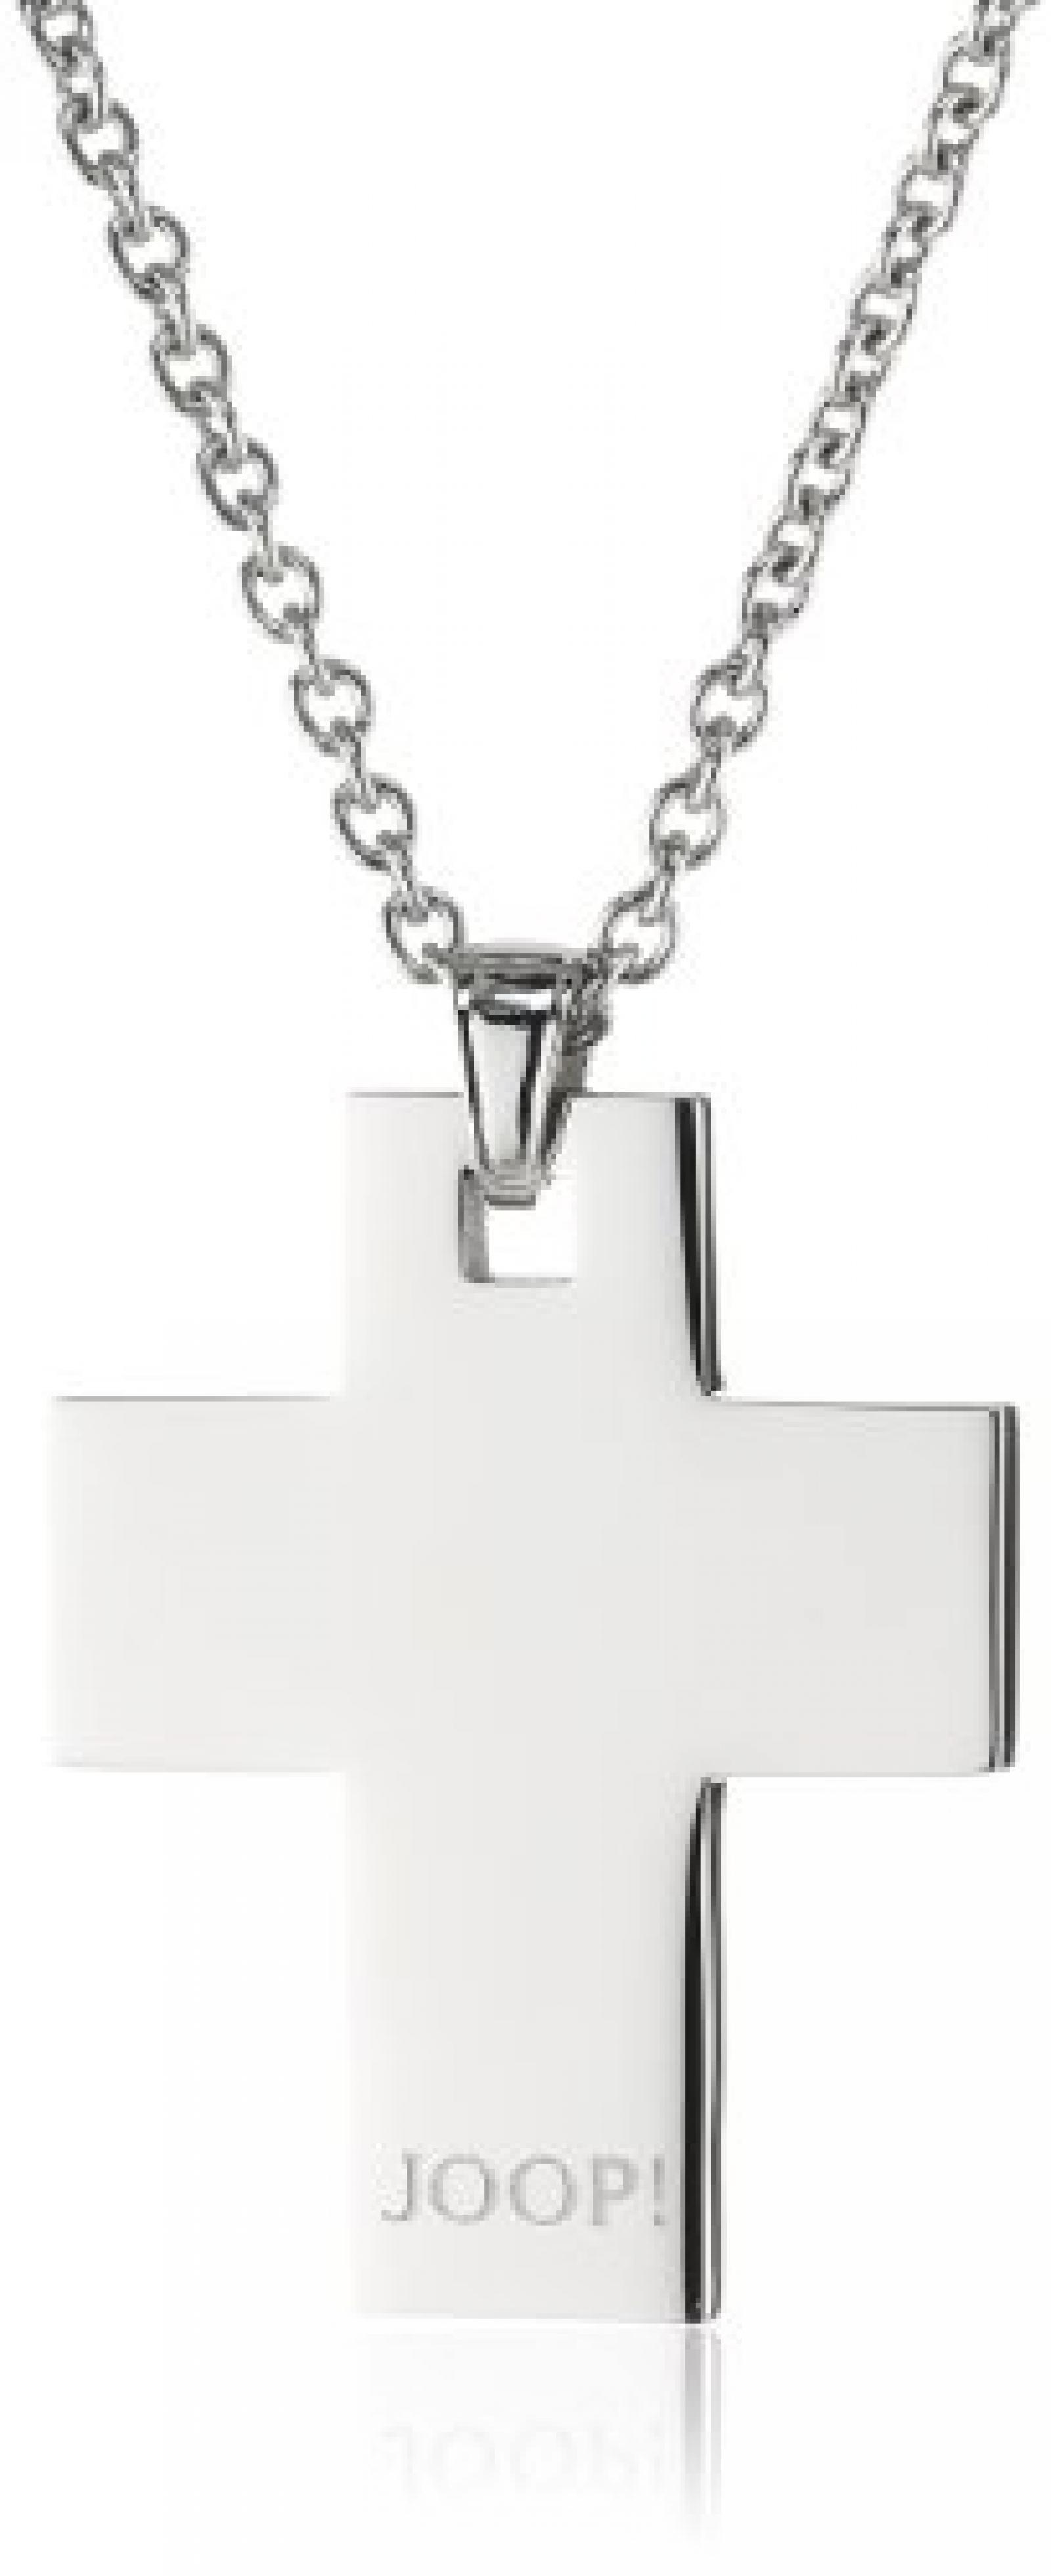 Joop Damen-Halskette Cross Edelstahl ca. 48 cm (45 + 3 cm) JPNL10560A420